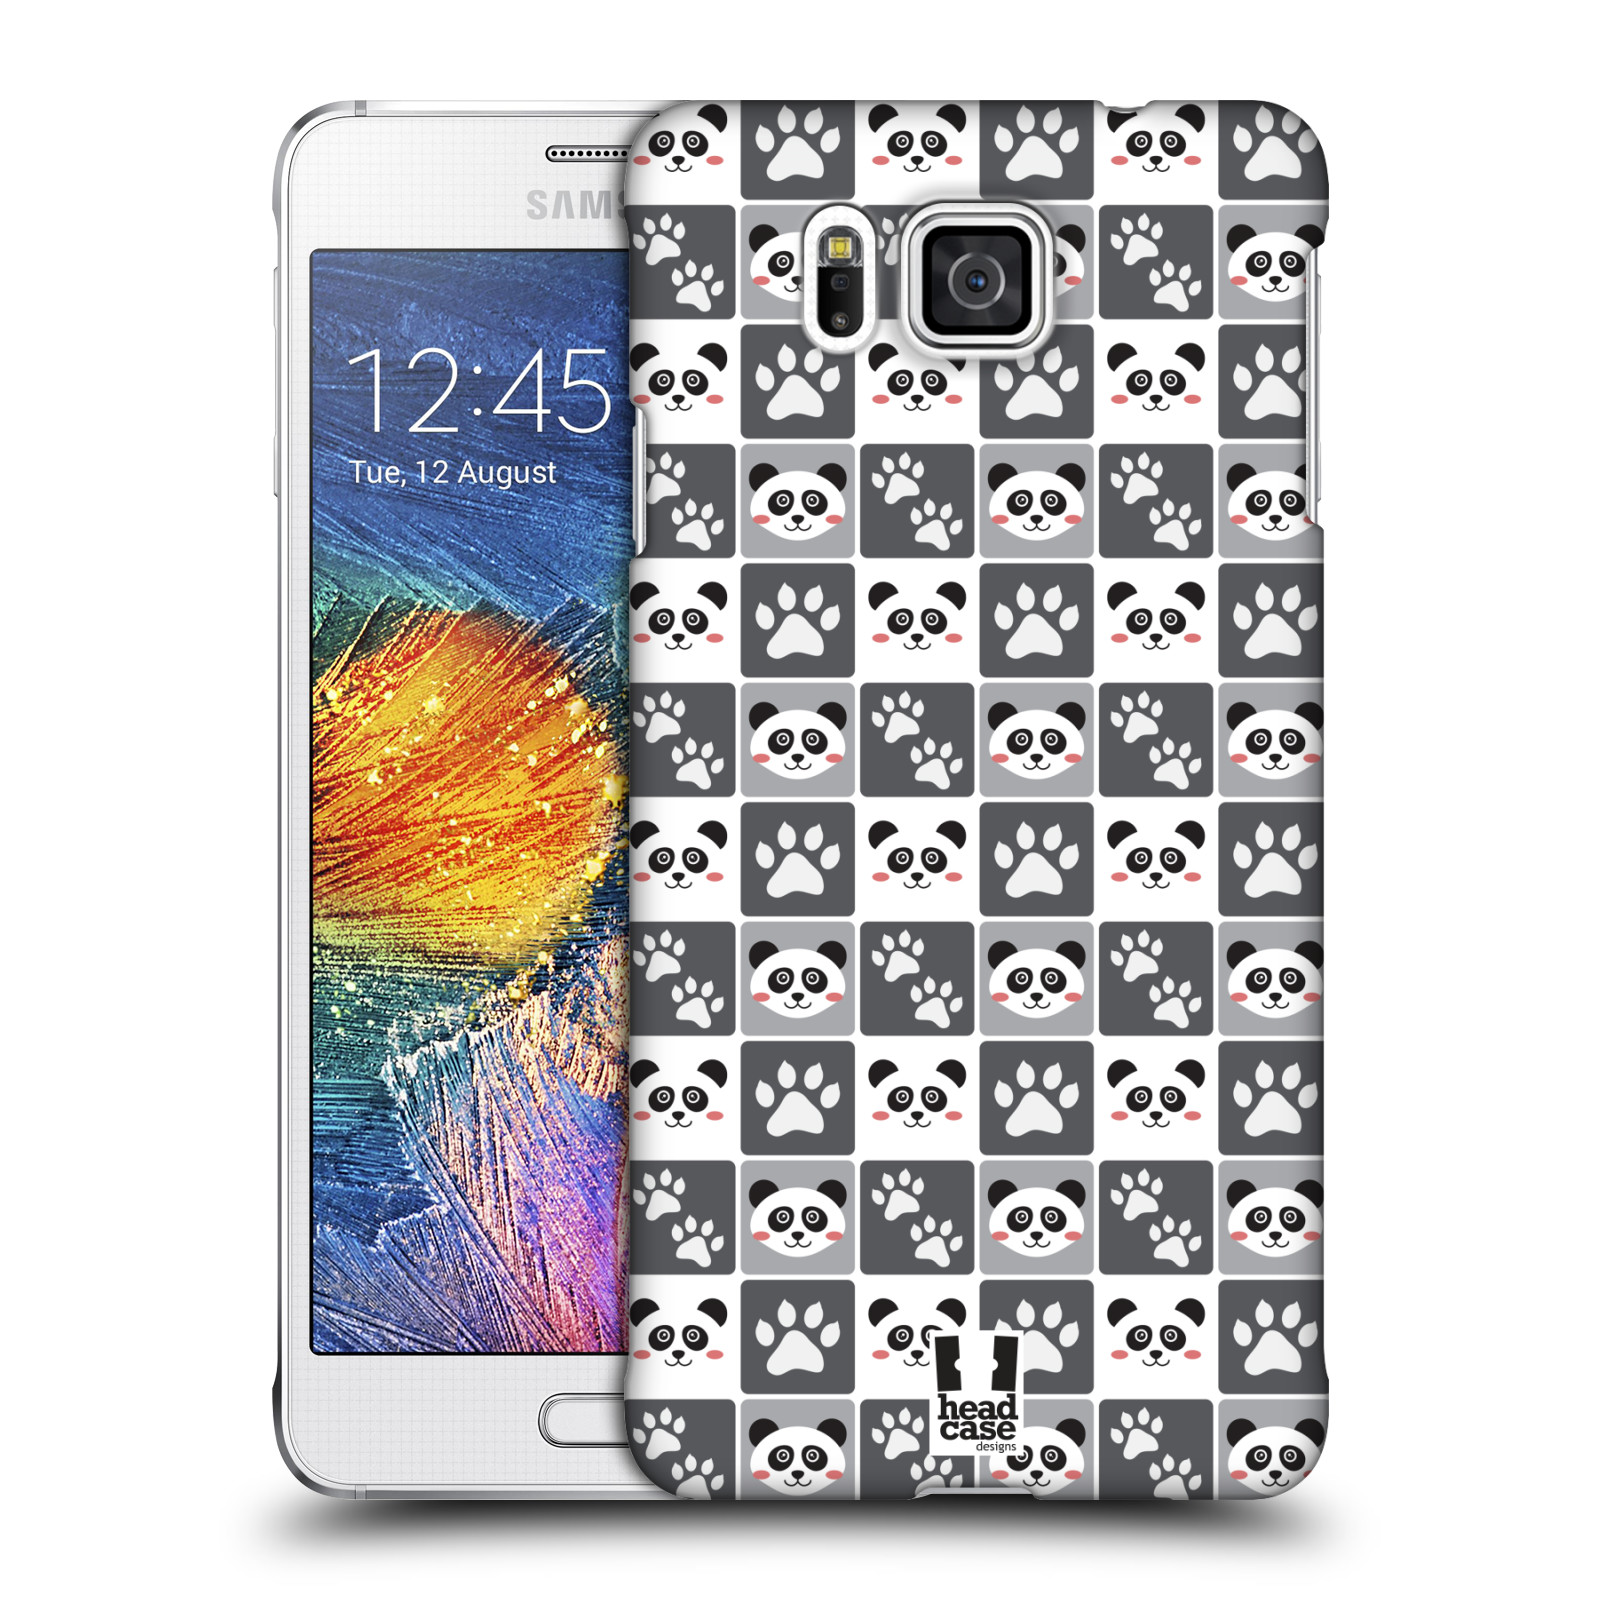 HEAD CASE plastový obal na mobil SAMSUNG Galaxy Alpha (G850) vzor Zvířecí razítka MEDVÍDEK PANDA